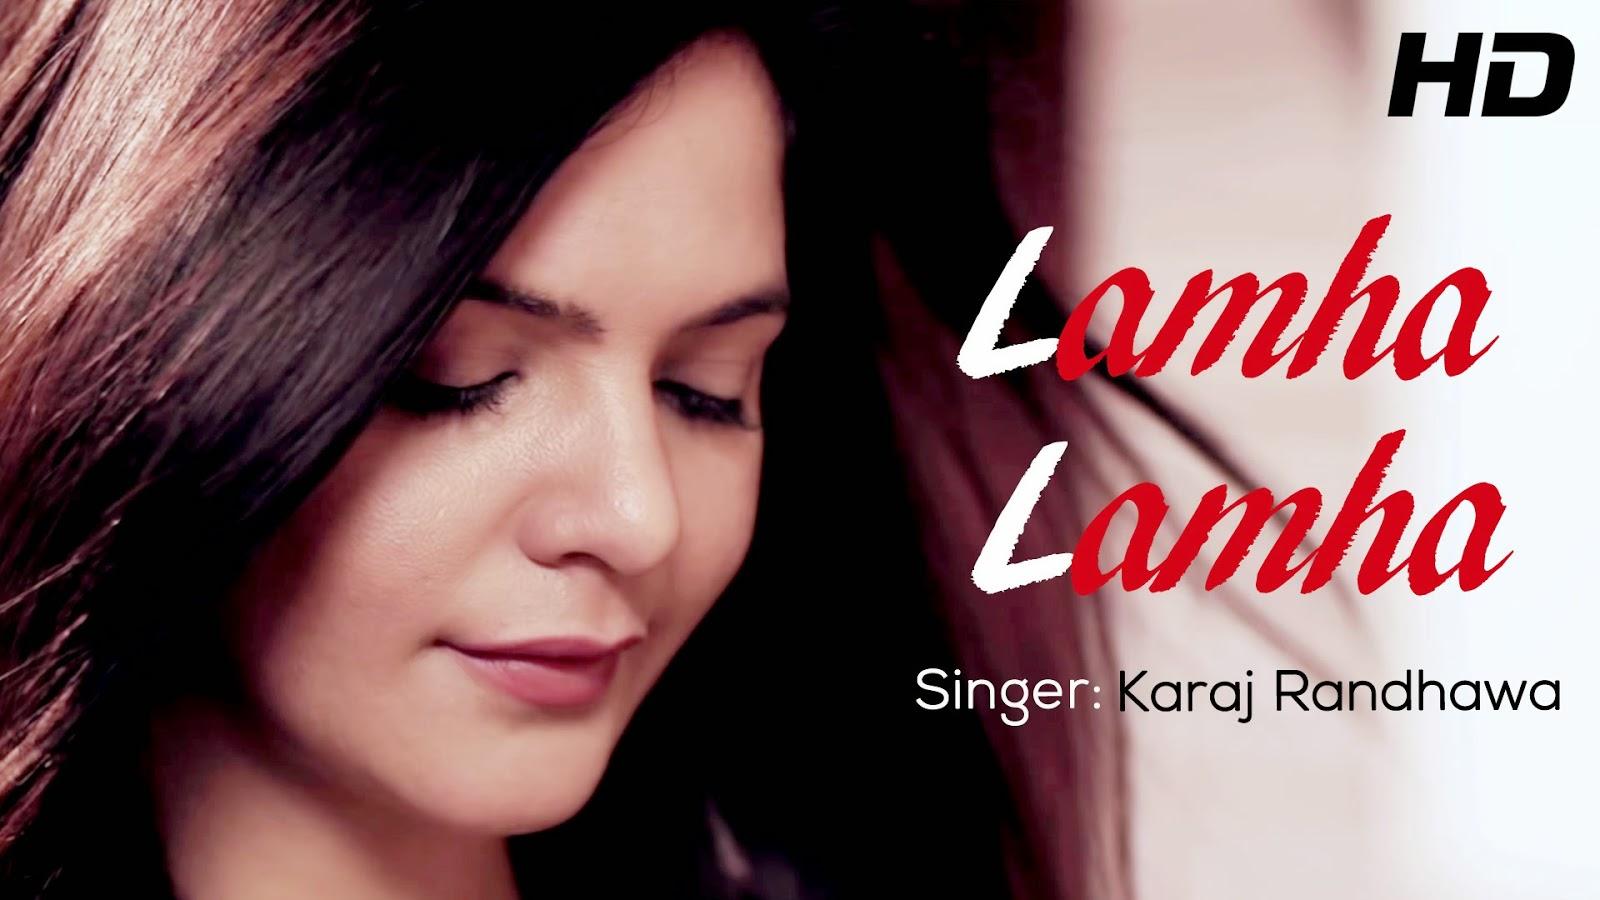 Khamoshiyan Mp3 Songs - Bollywood Music